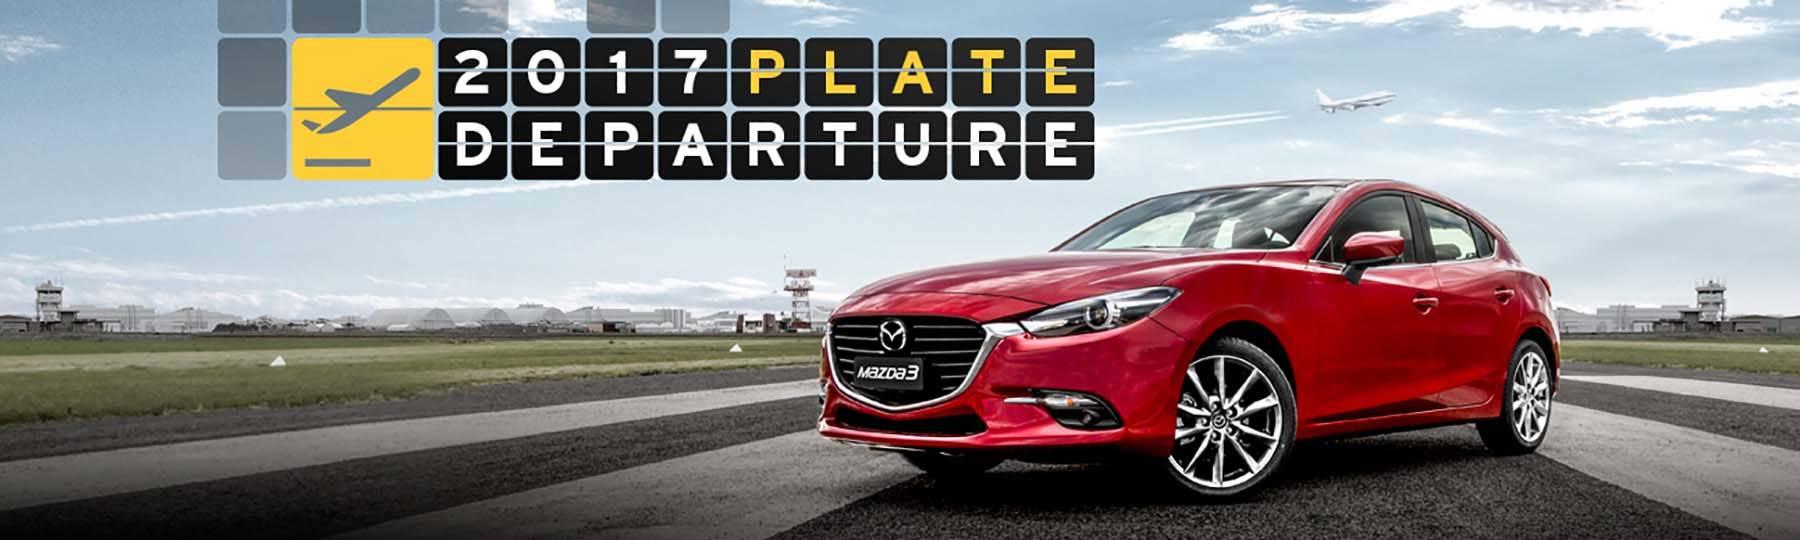 Mazda 2017 Plate Departure